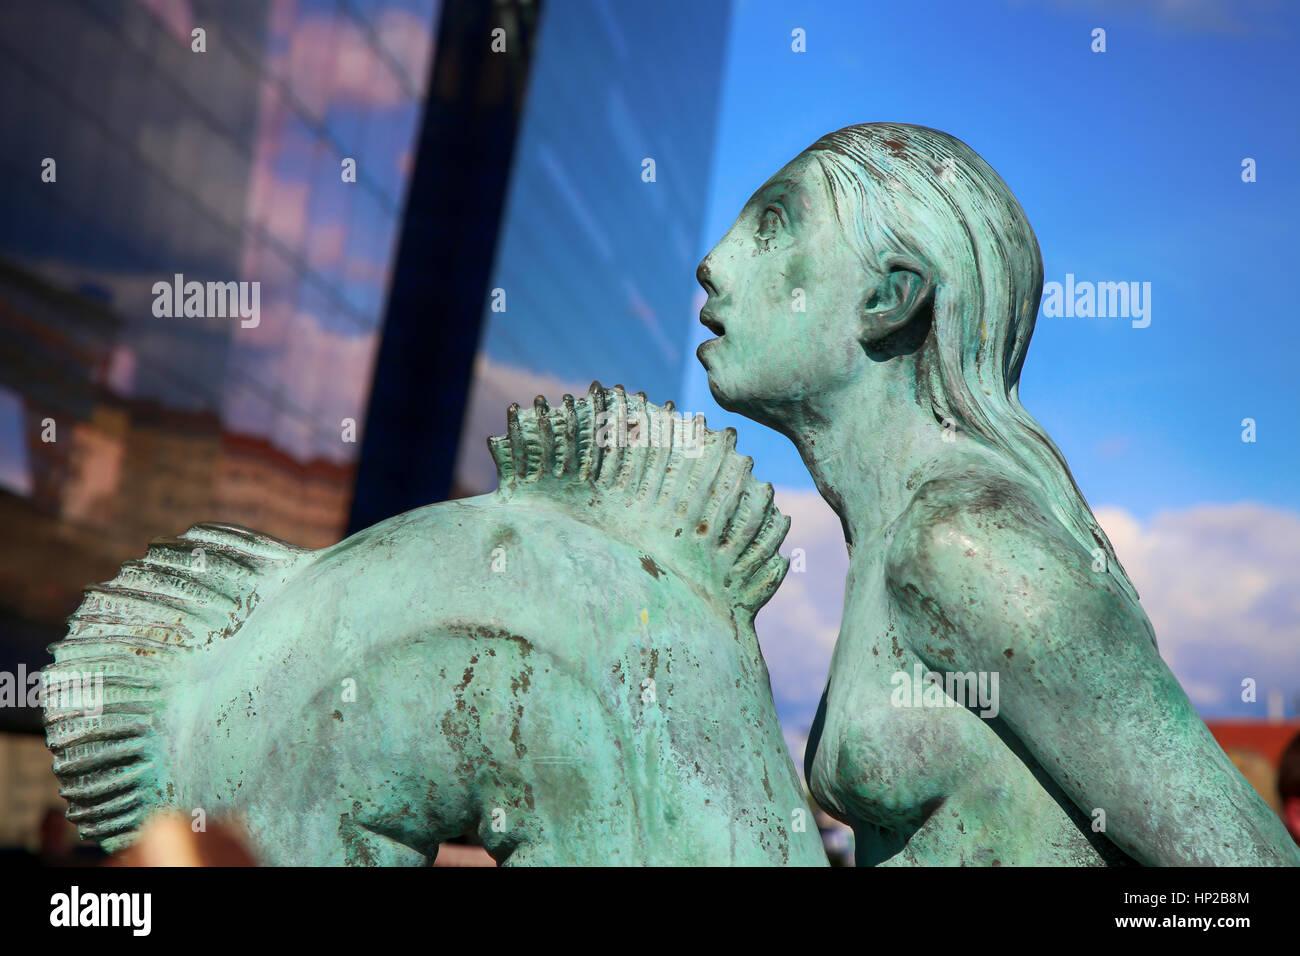 Mermaid statue in front of the main harbour The Black Diamond, The Copenhagen Royal Library (Det Kongelige Bibliotek) Stock Photo